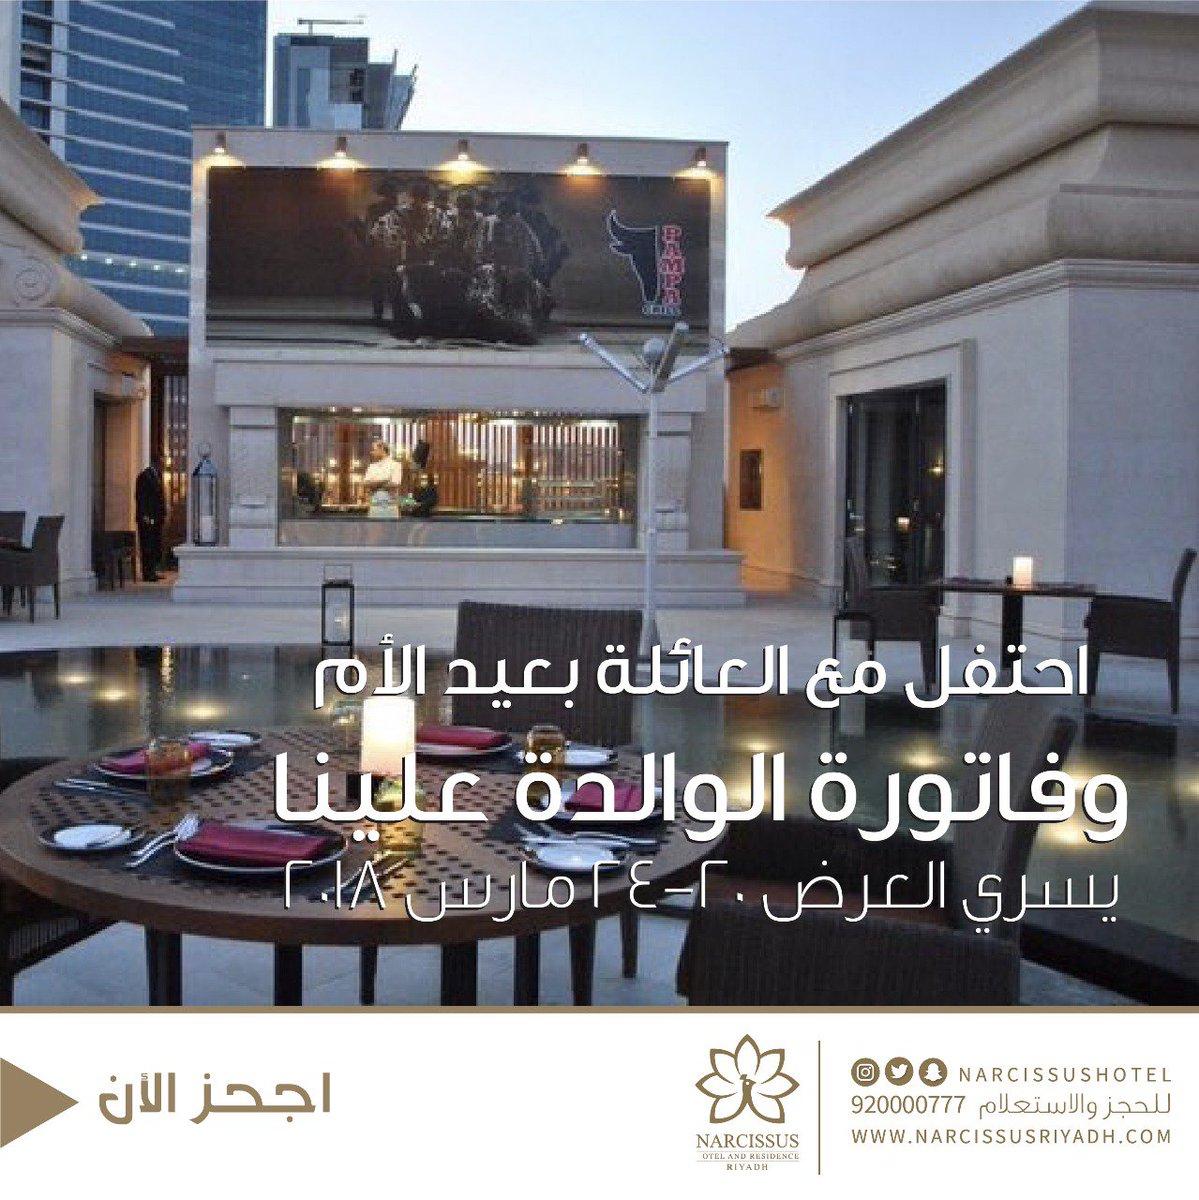 Narcissus Hotels & Resorts's photo on #نارسس_مع_عيد_الام